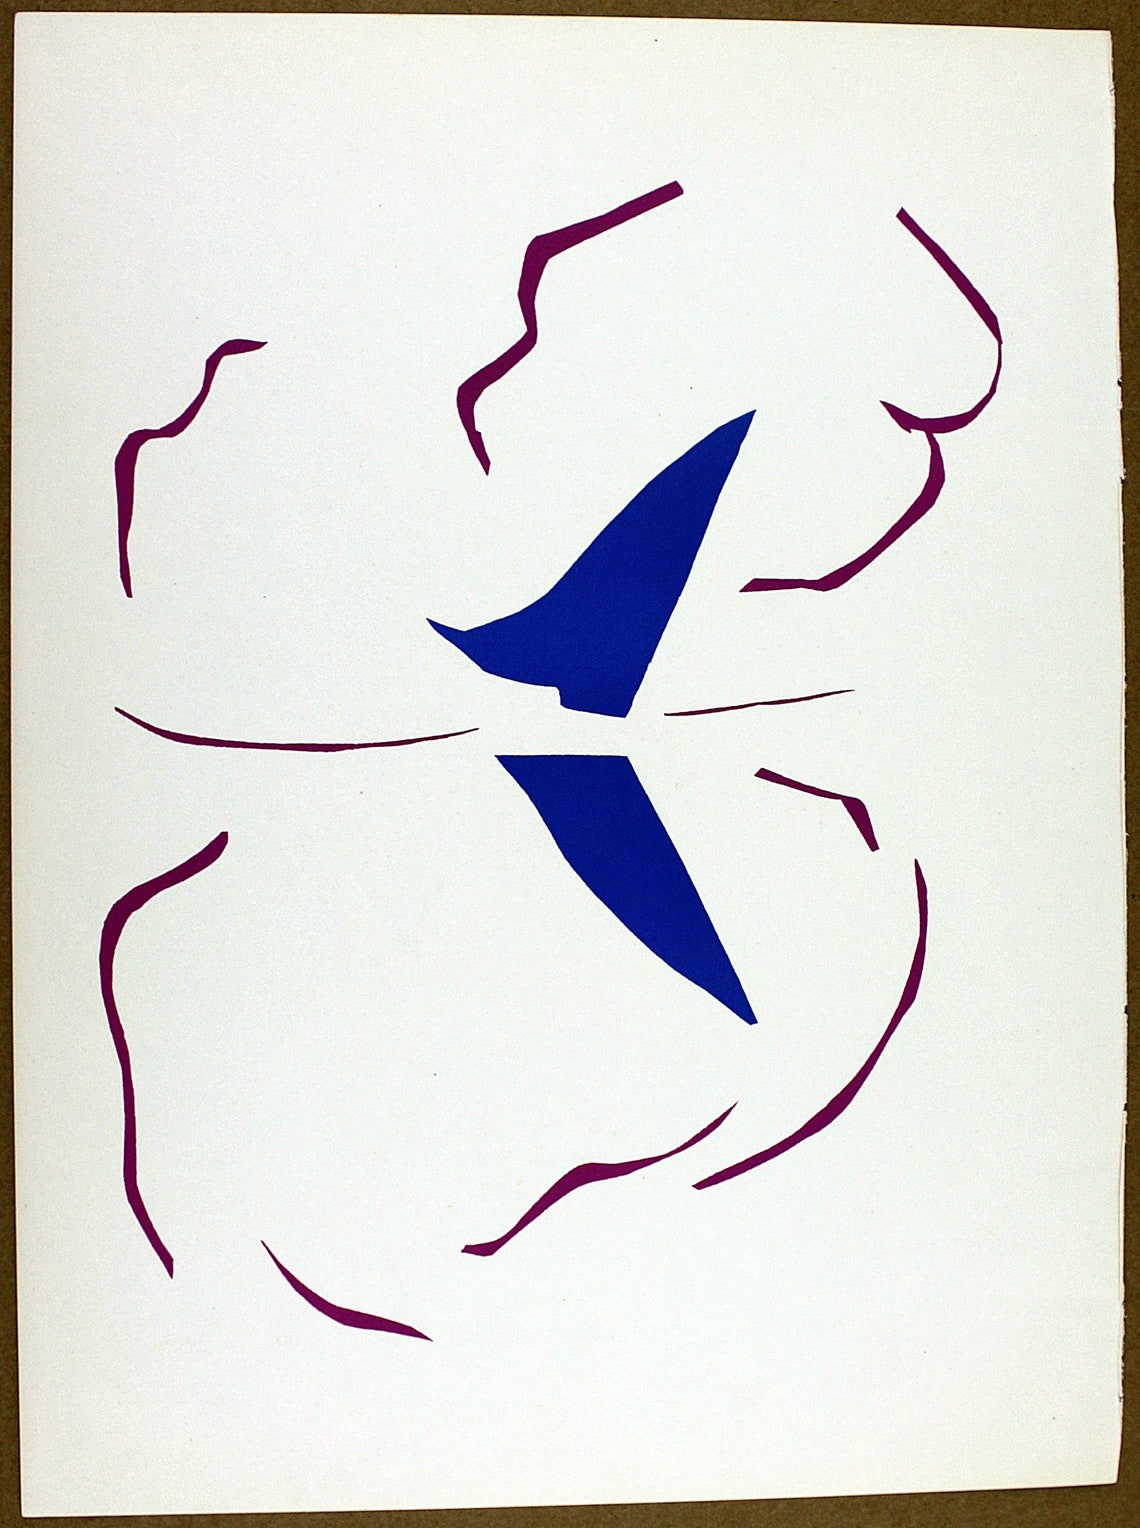 Vintage HENRI MATISSE Original Lithograph 1958 Color Art image 0